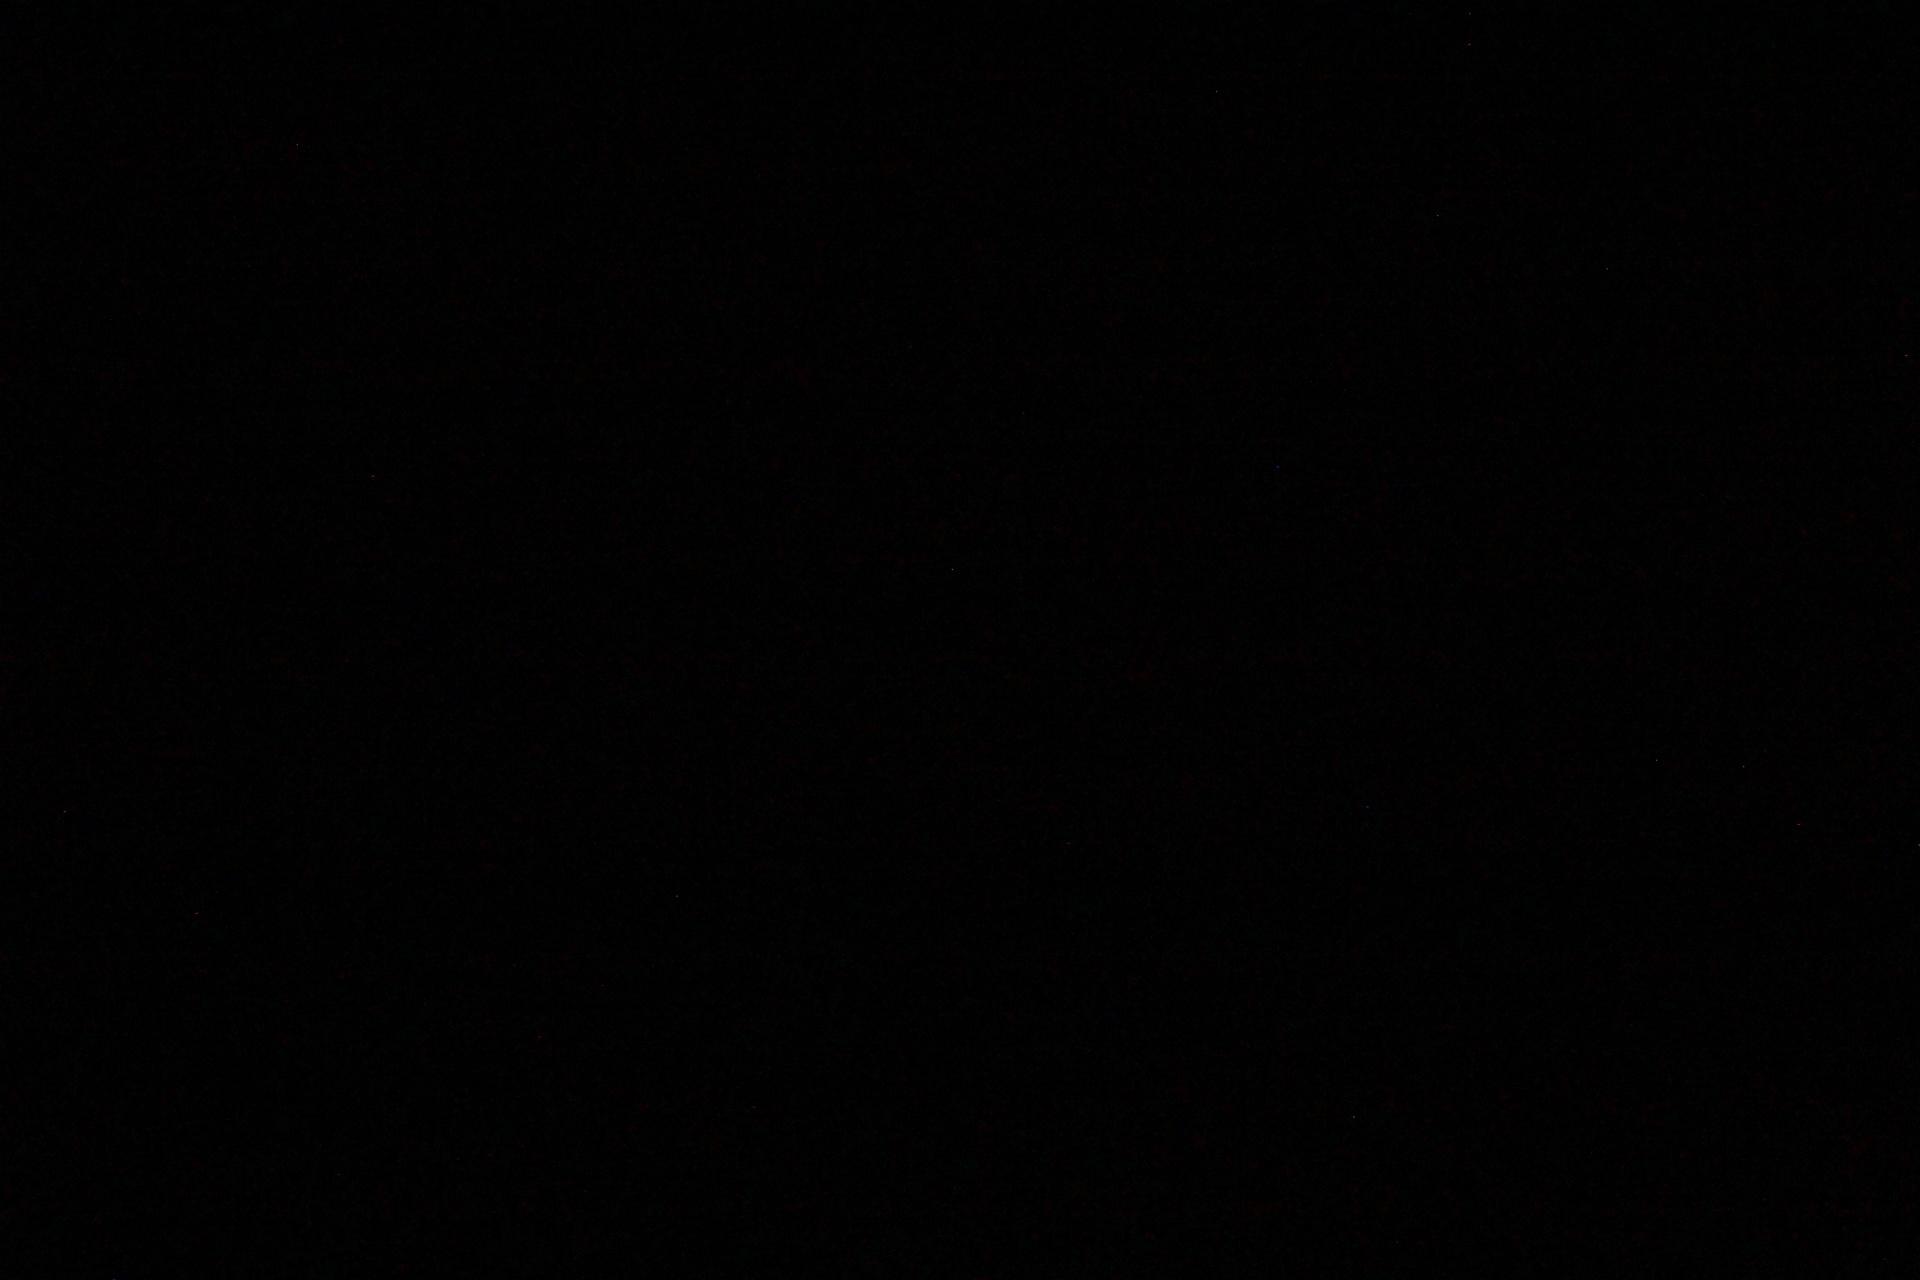 black-background-1468370534d5s